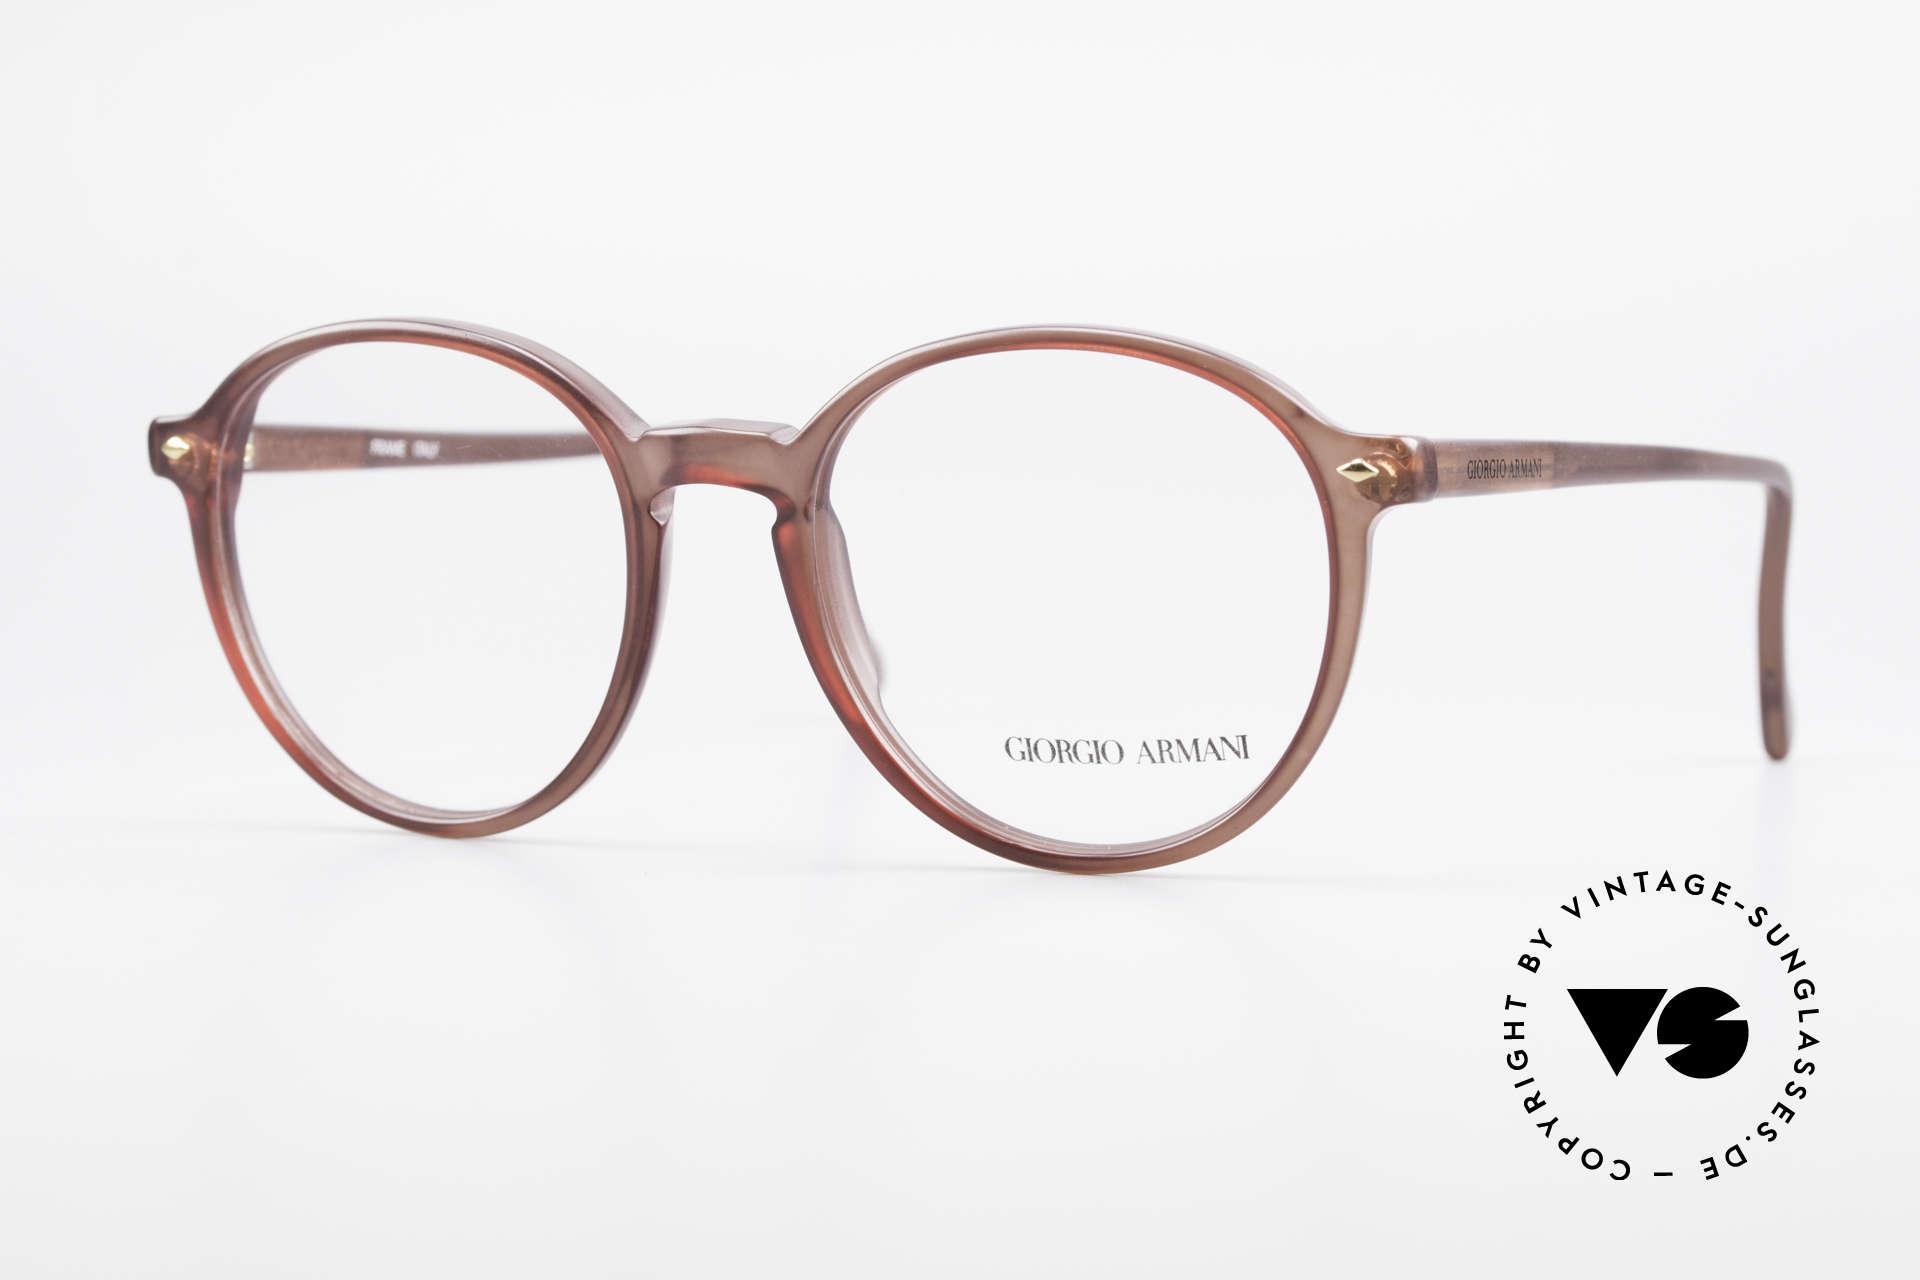 Giorgio Armani 325 Vintage Panto 90's Eyeglasses, timeless vintage Giorgio Armani designer eyeglasses, Made for Men